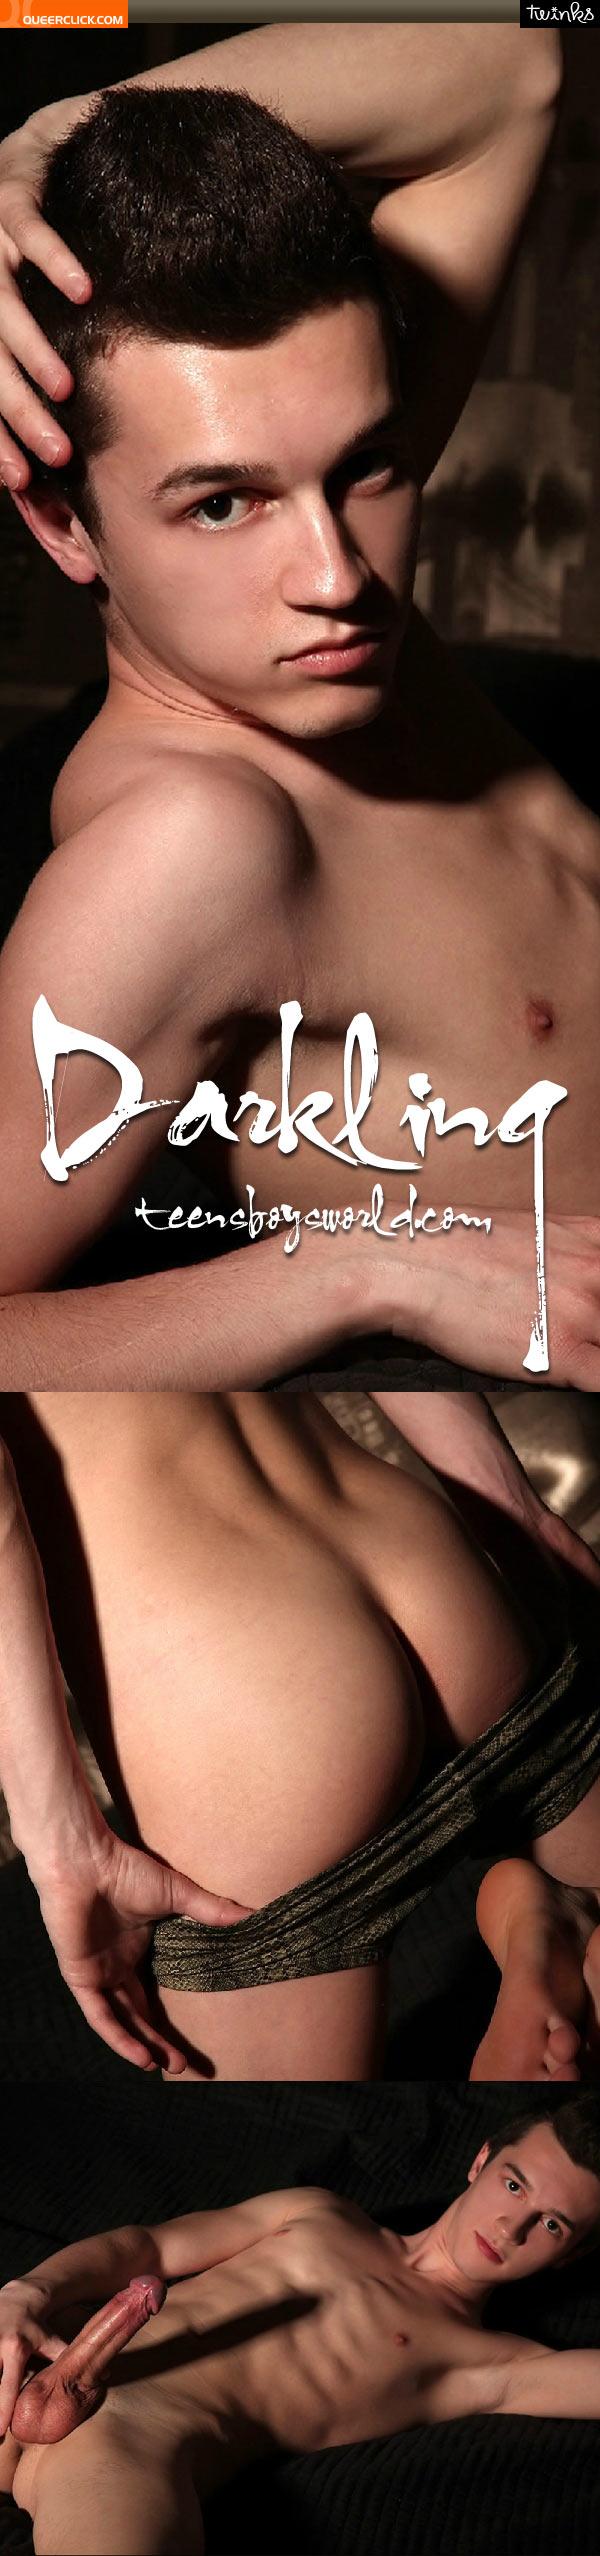 teens boys world darkling